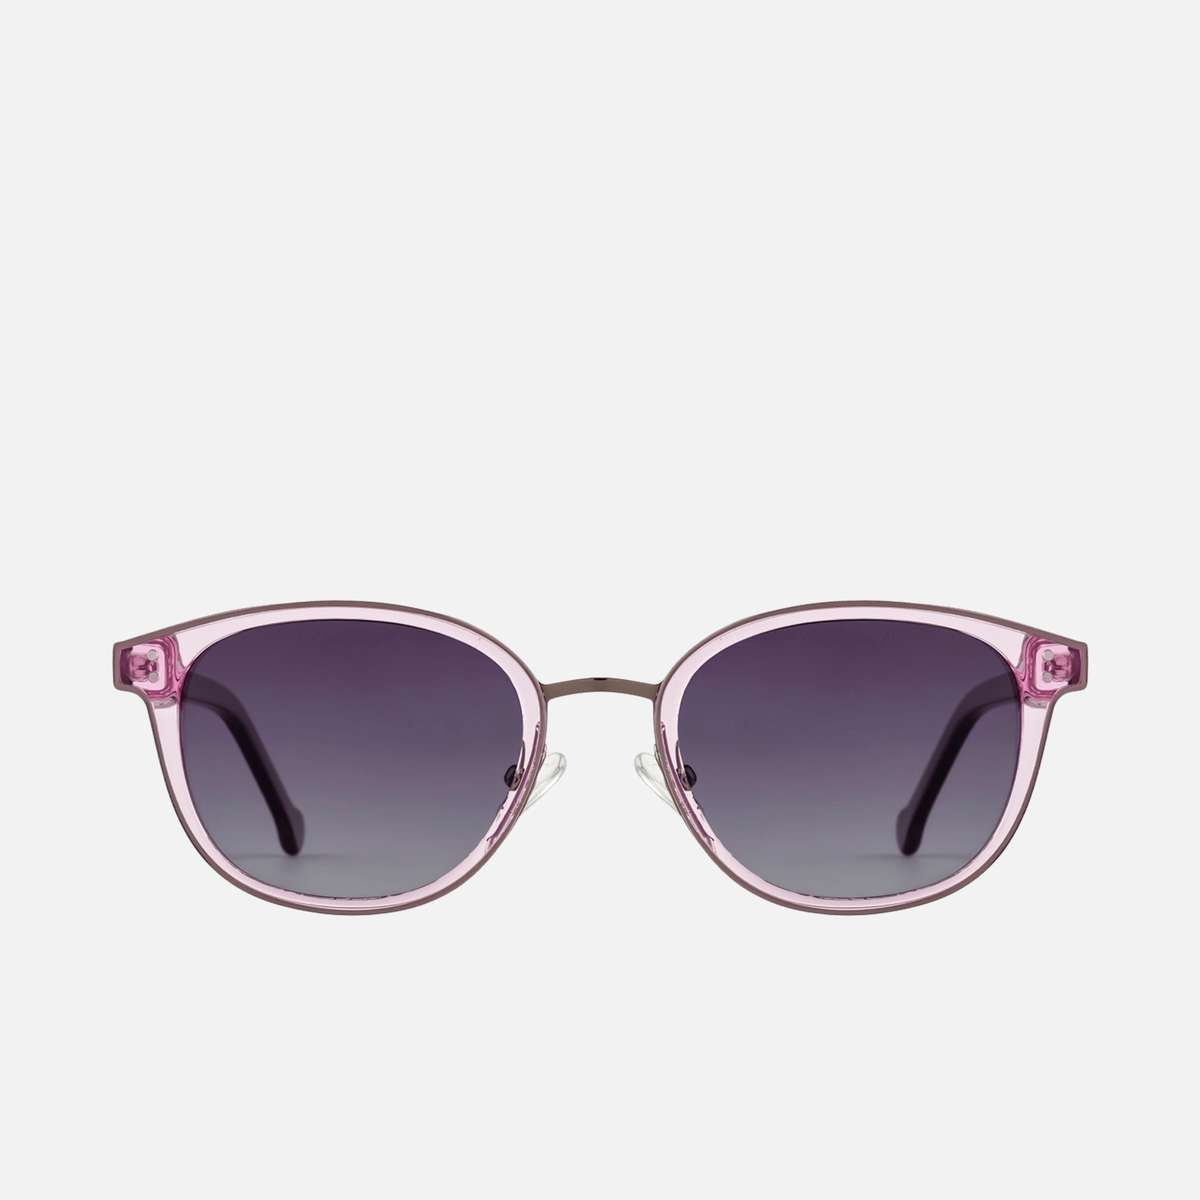 5.FEMINA FLAUNT Women UV-Protected Oval Sunglasses- 9014-C2